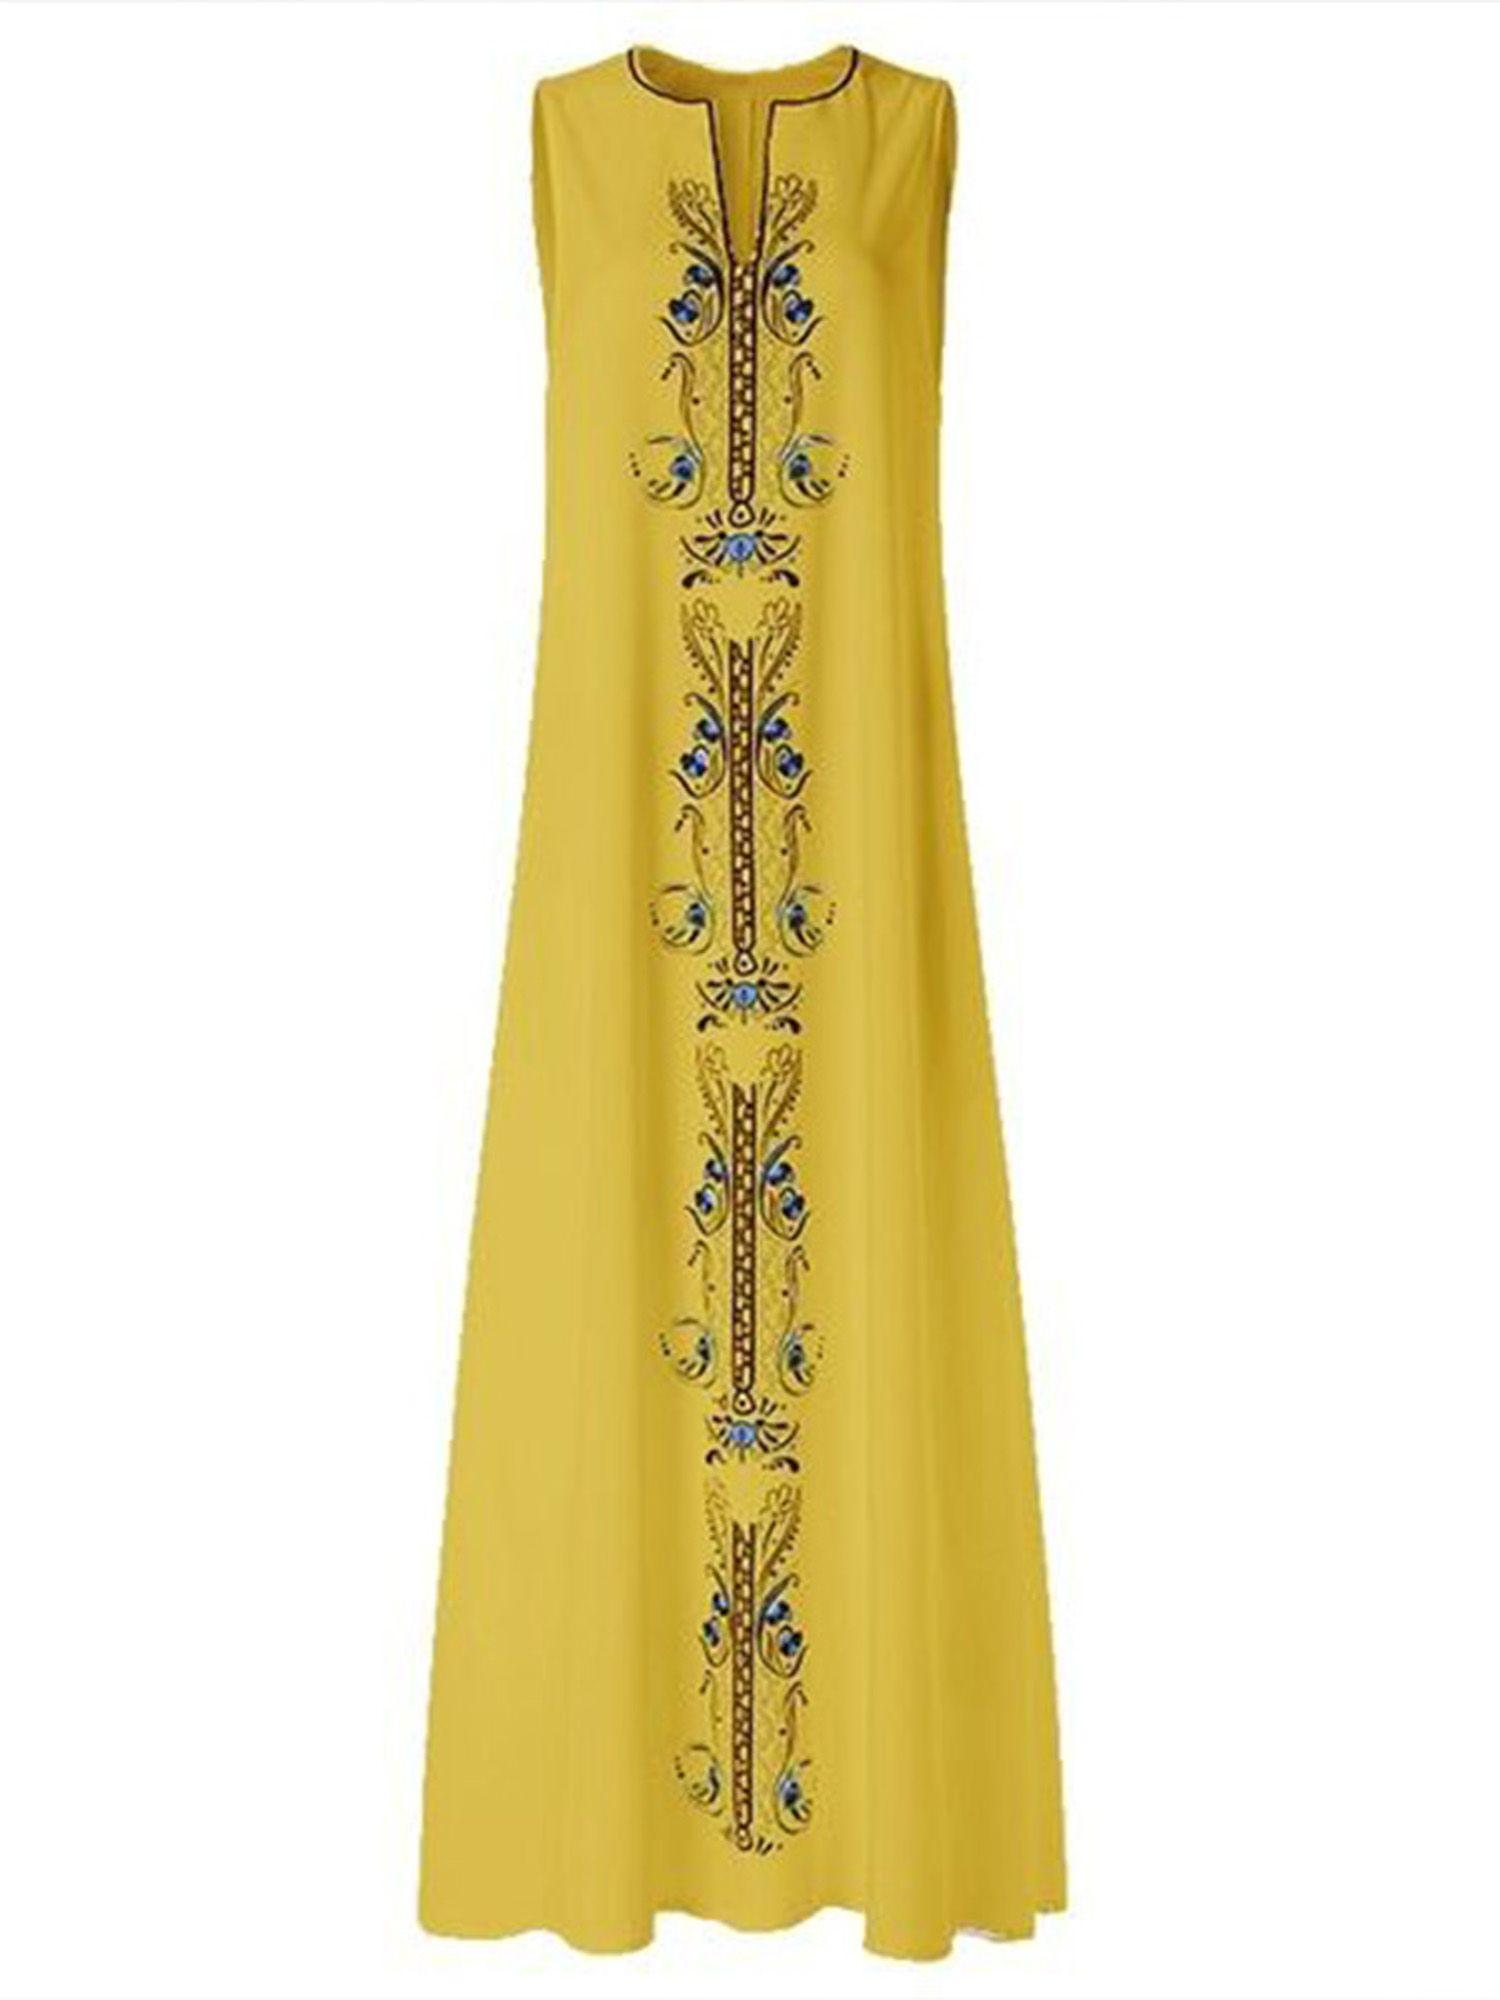 Wodstyle Tuscom Women S Plus Size Floral Sleeveless Loose V Neck Party Maxi Dress Walmart Com Vintage Maxi Dress Maxi Dress Party Retro Print Dresses [ 2000 x 1500 Pixel ]